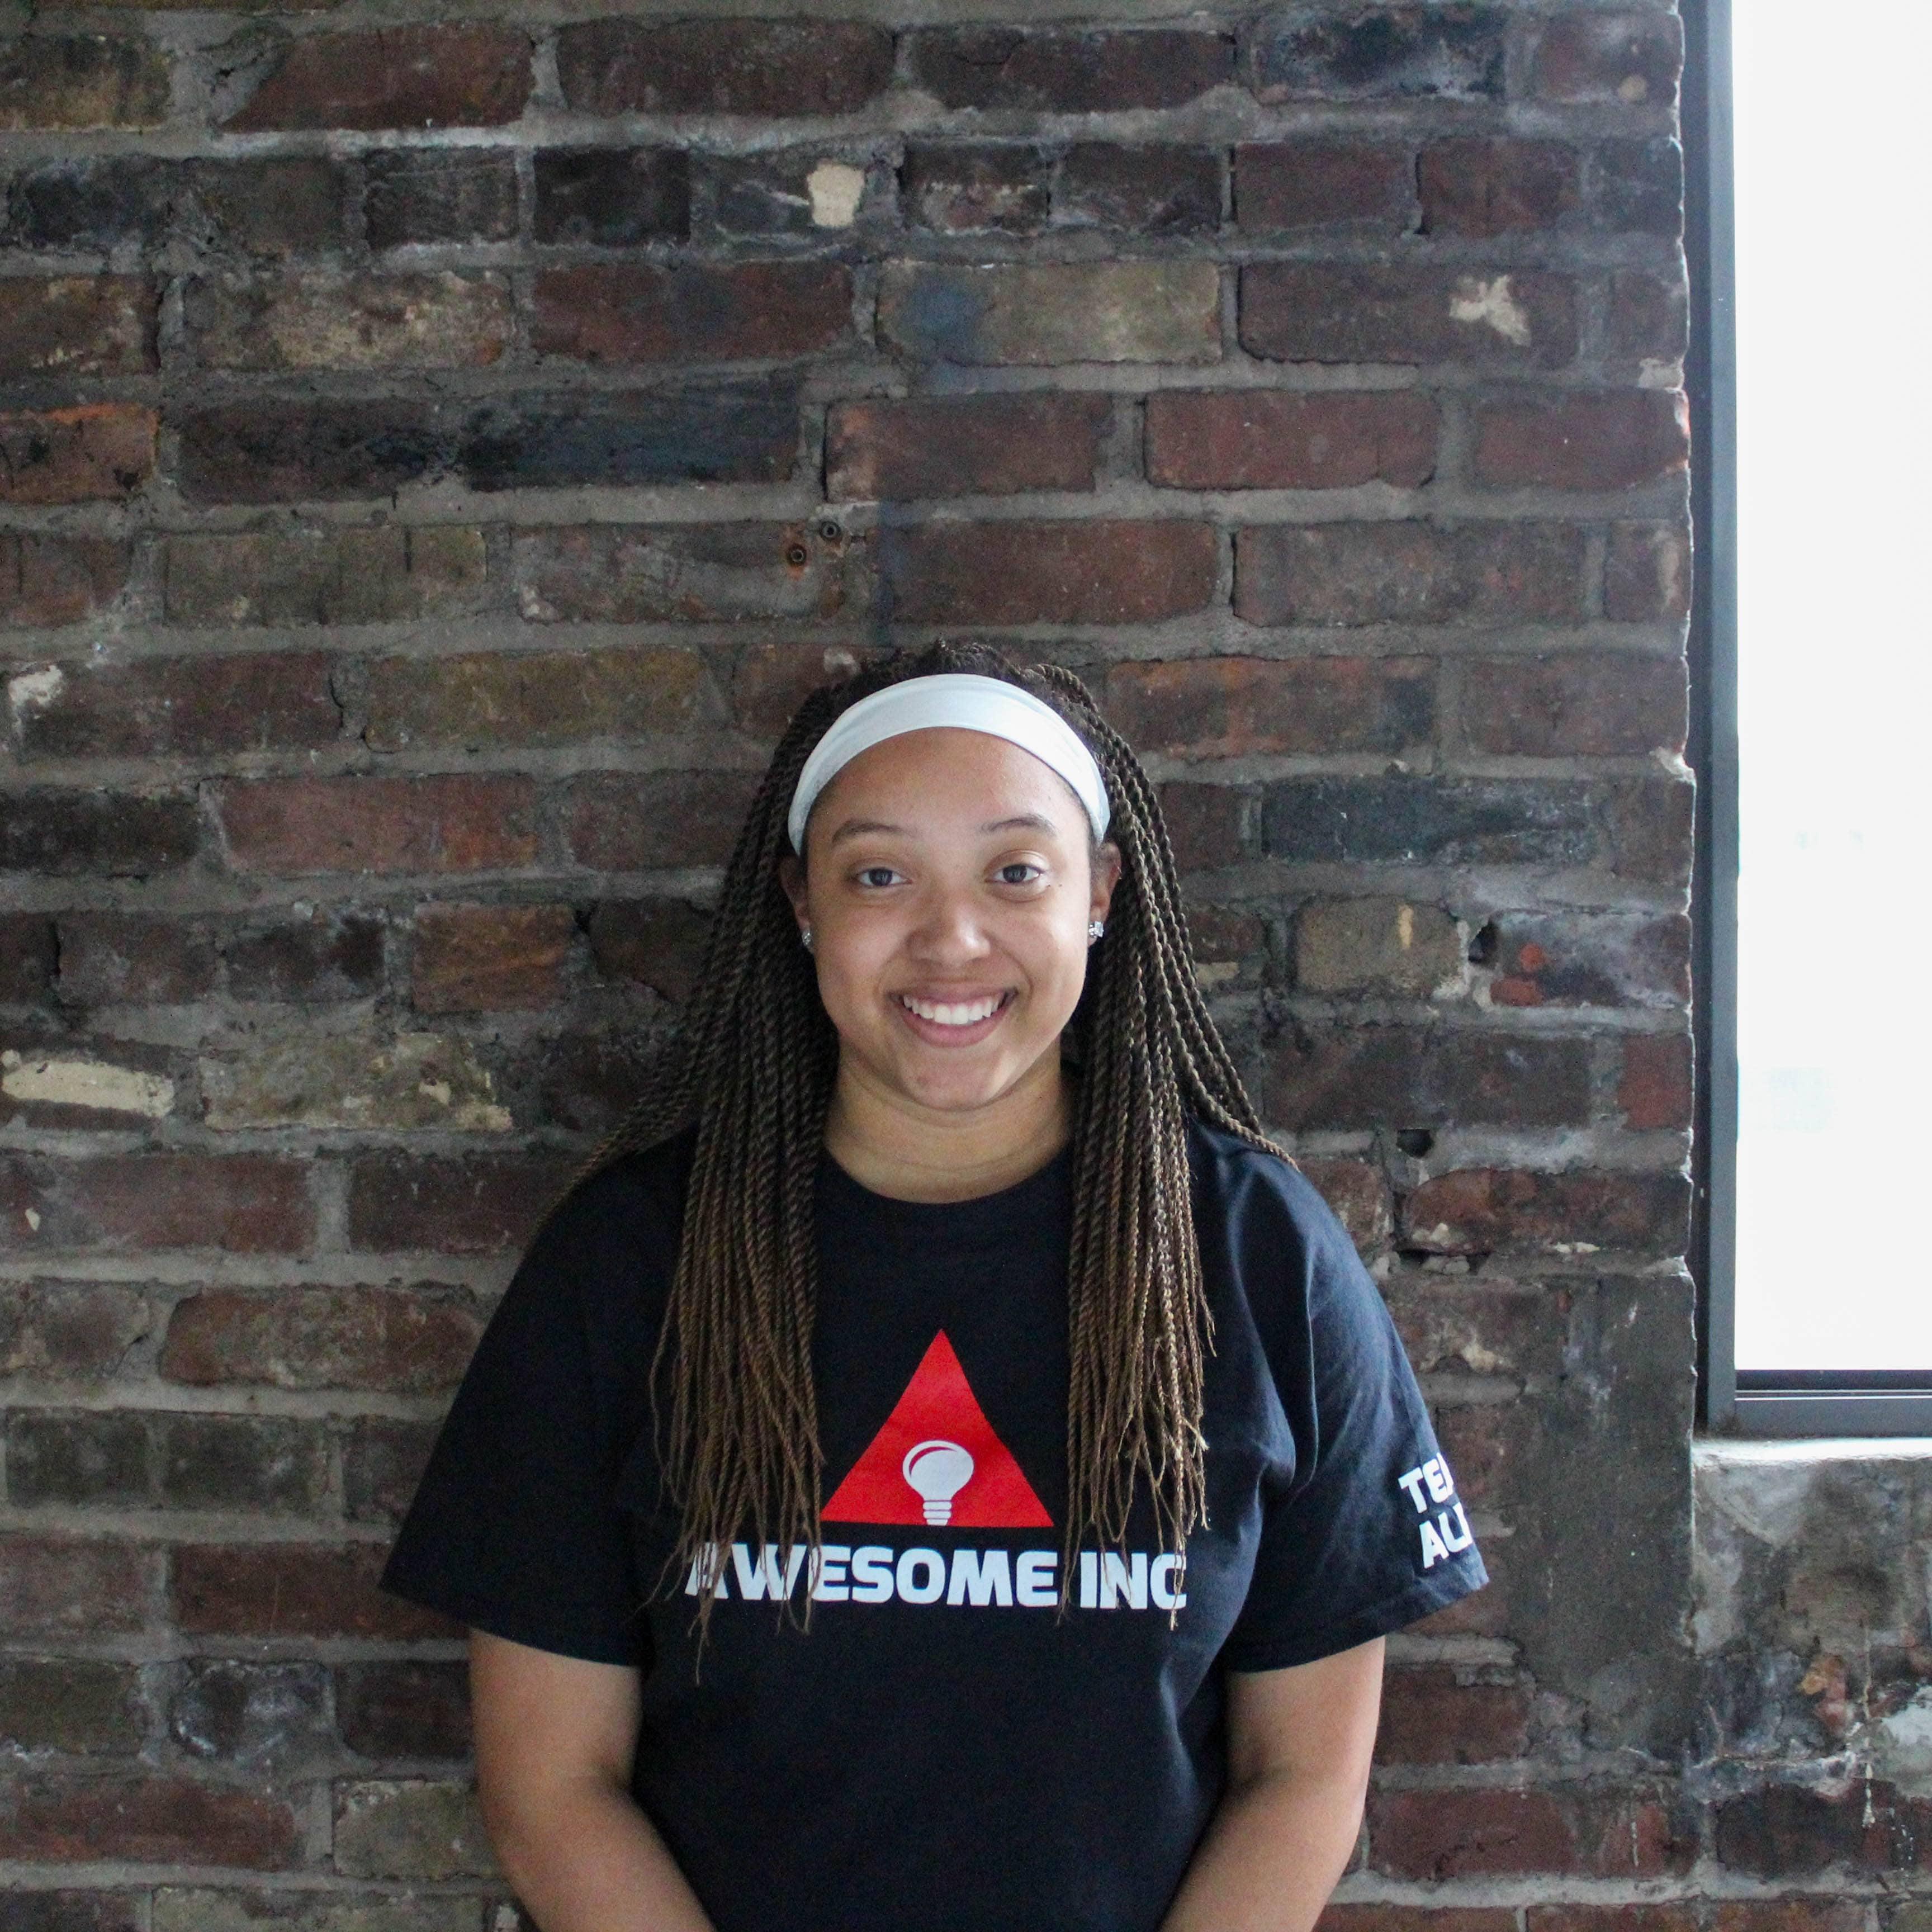 Awesome Inc team member, Skye Brown